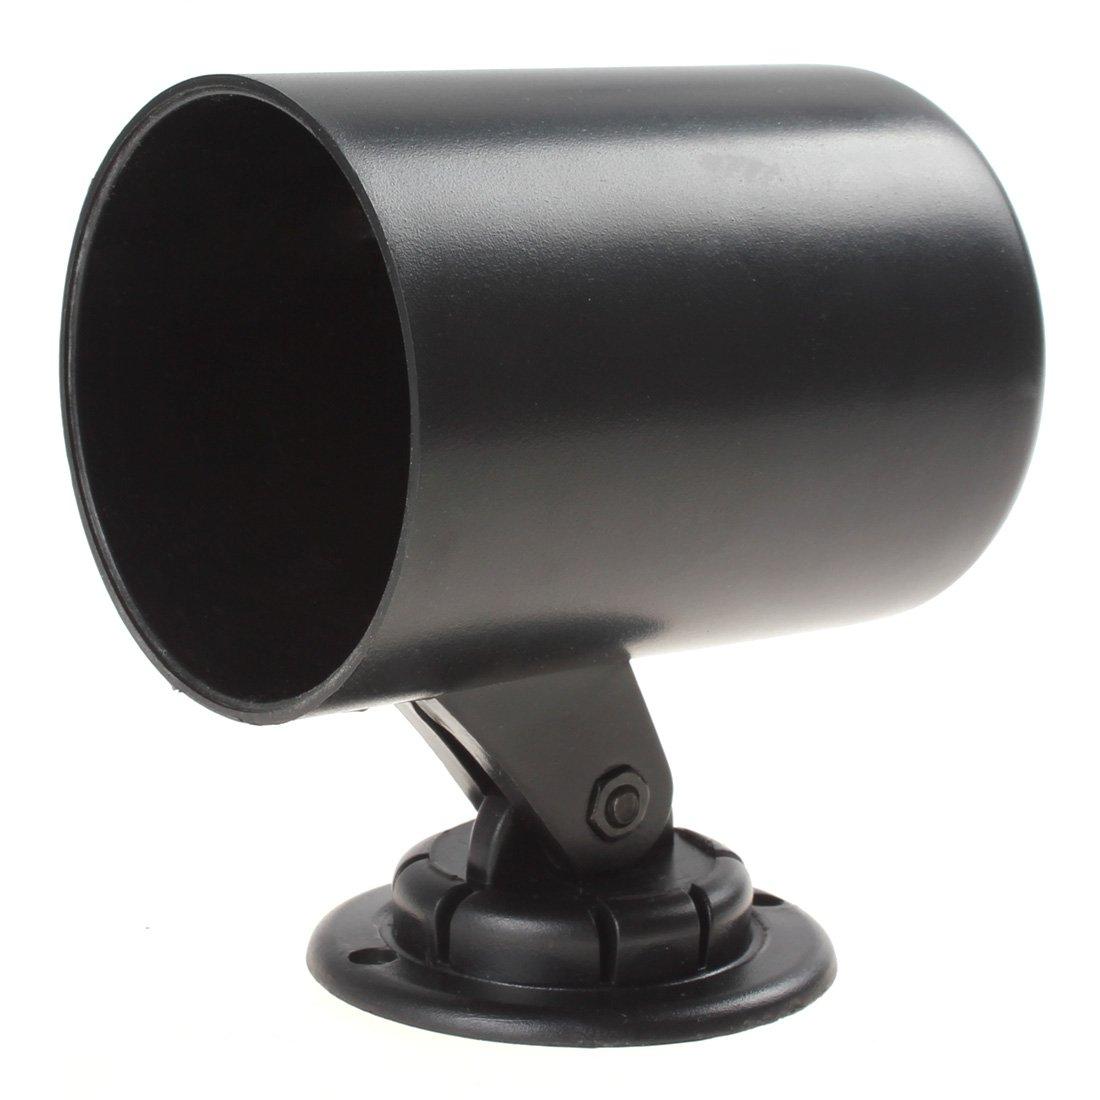 Universal 52mm 2' Black Auto Car Gauge Meter Pod Holder Cup Mount for Car Motor Truck Gauge ePathChina